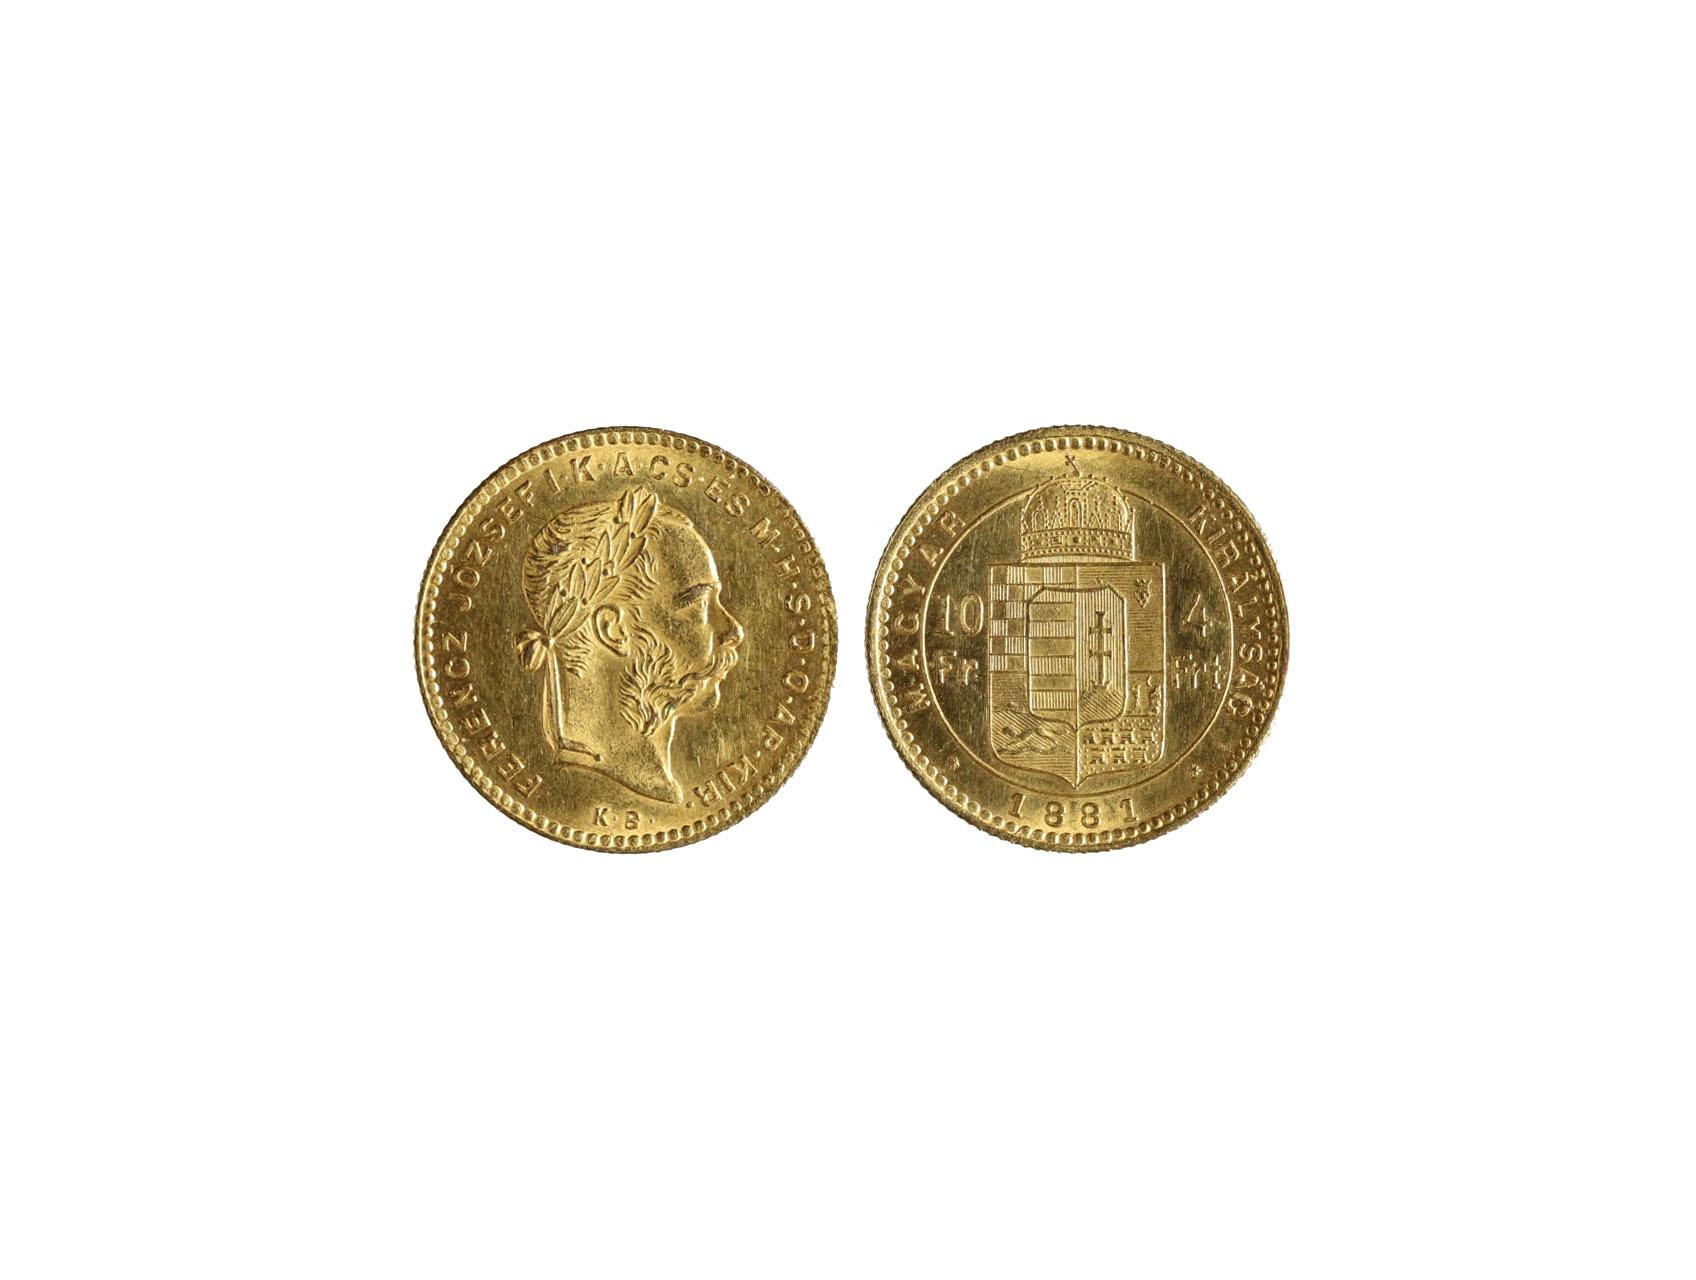 František Josef I. 1848-1916 - 4 Zlatník 1881 K.B., N124